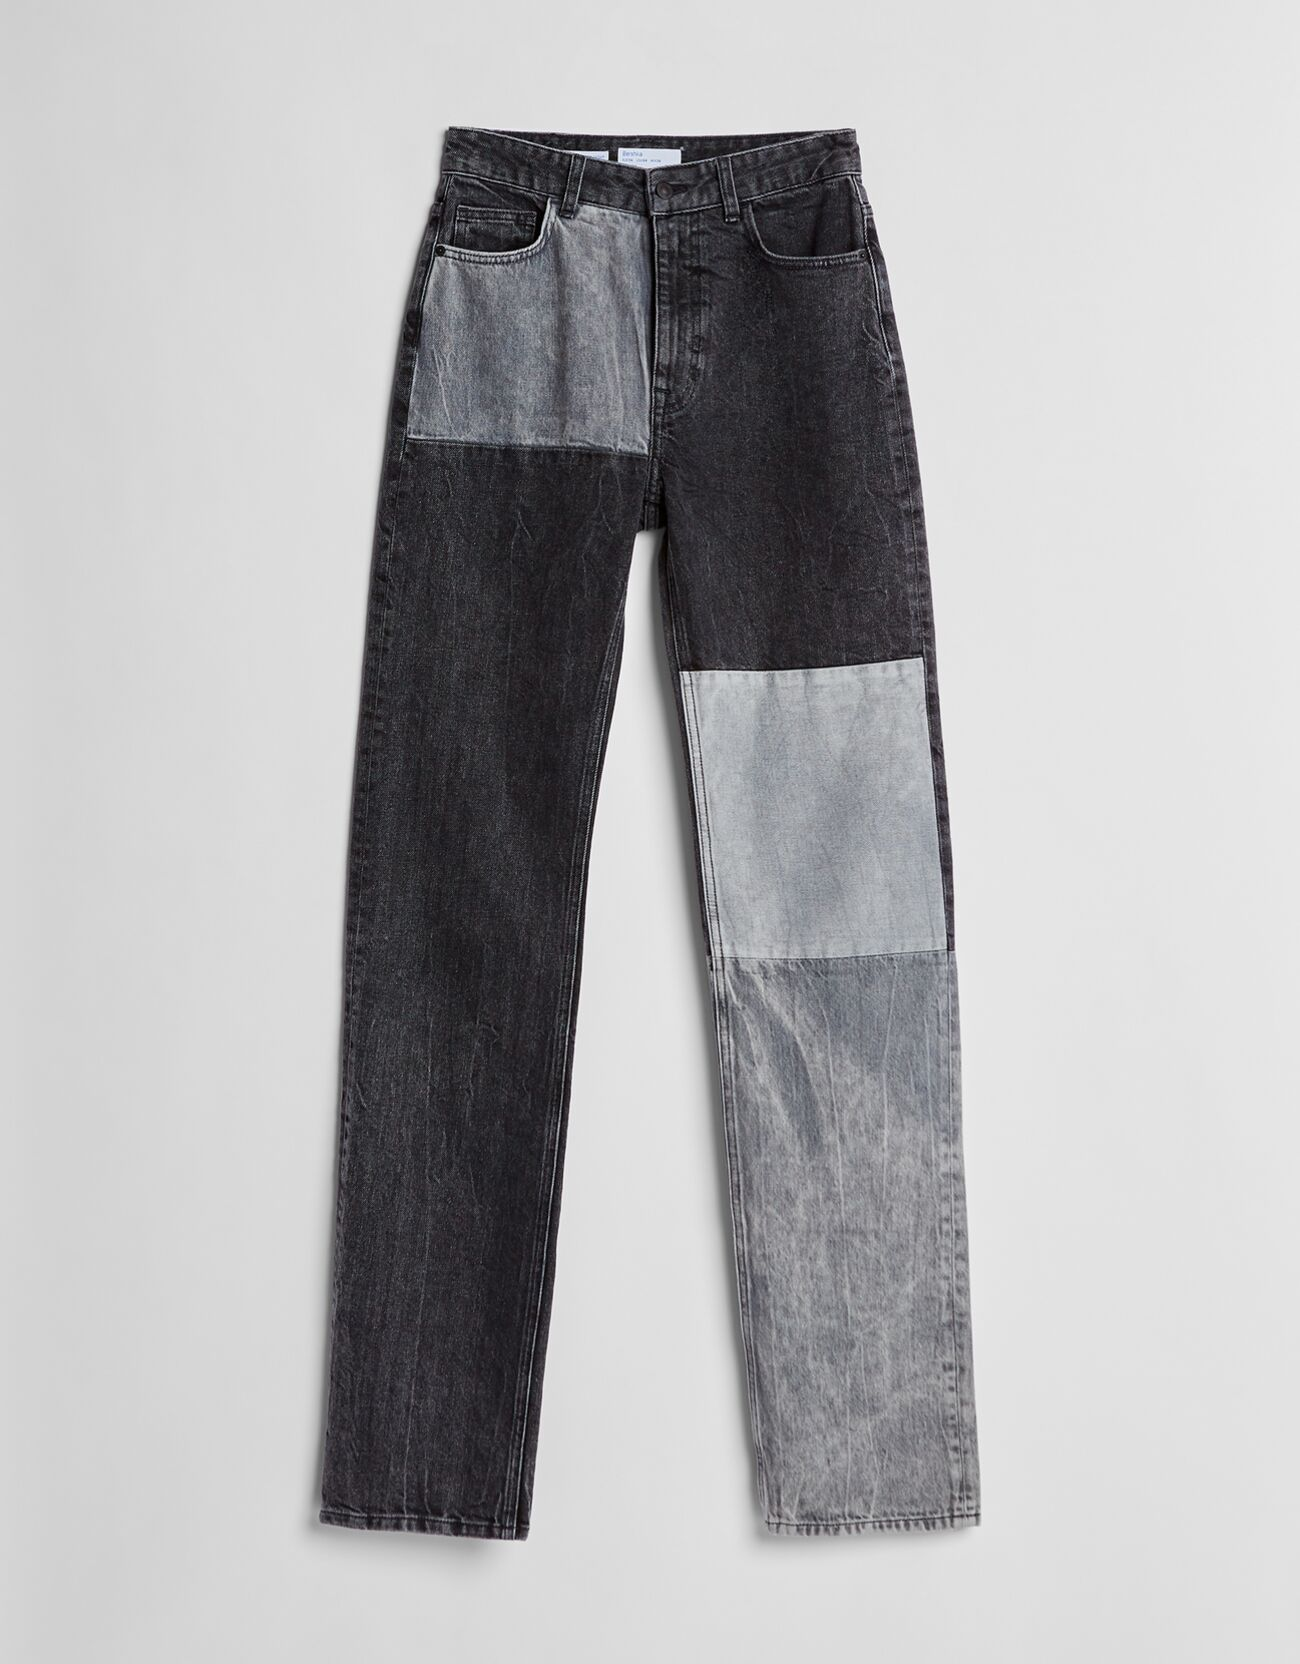 Jeans straight high waist paneles contraste.